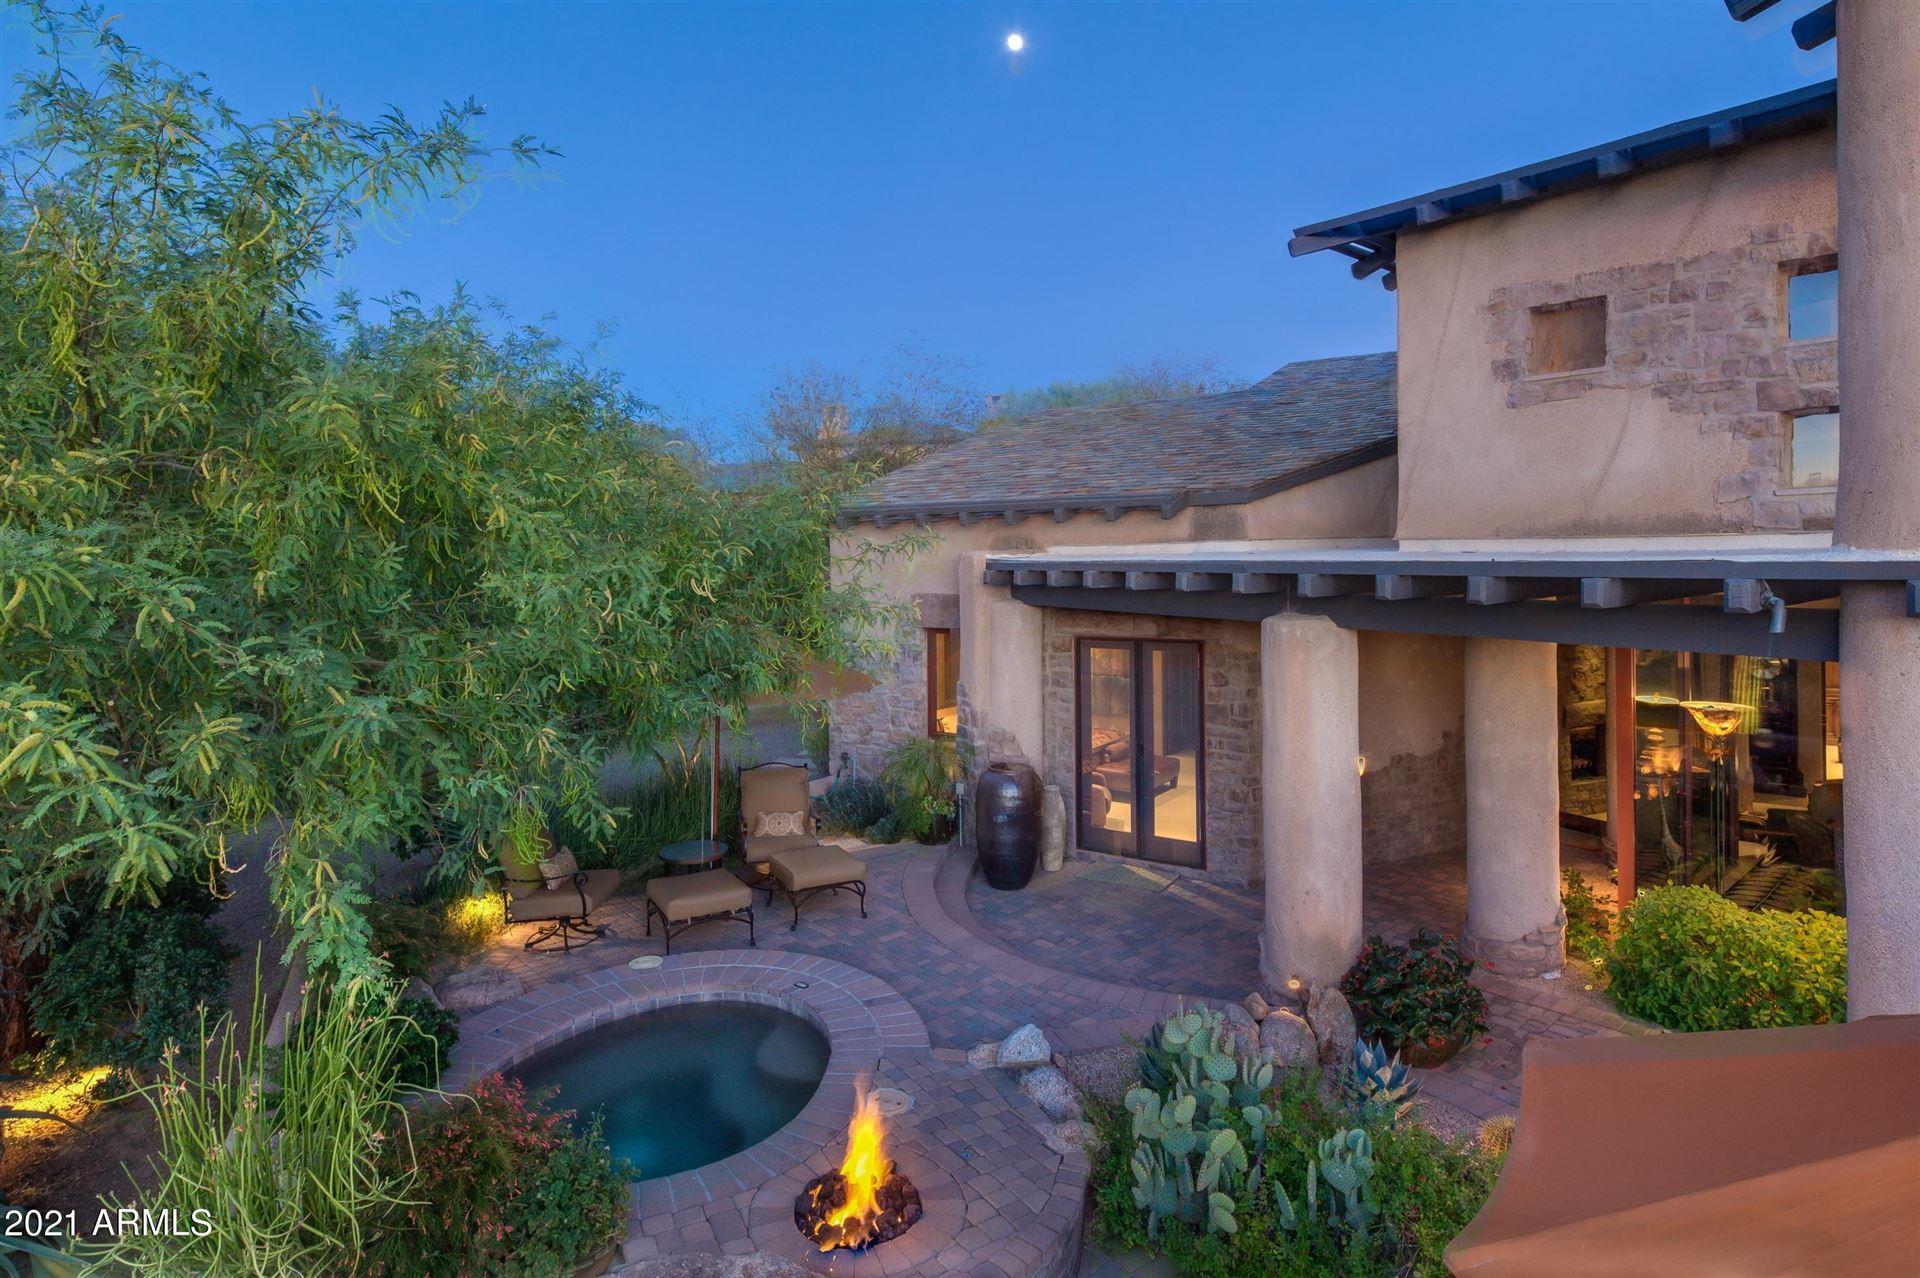 Photo of 27915 N 100TH Place #106, Scottsdale, AZ 85262 (MLS # 6249767)